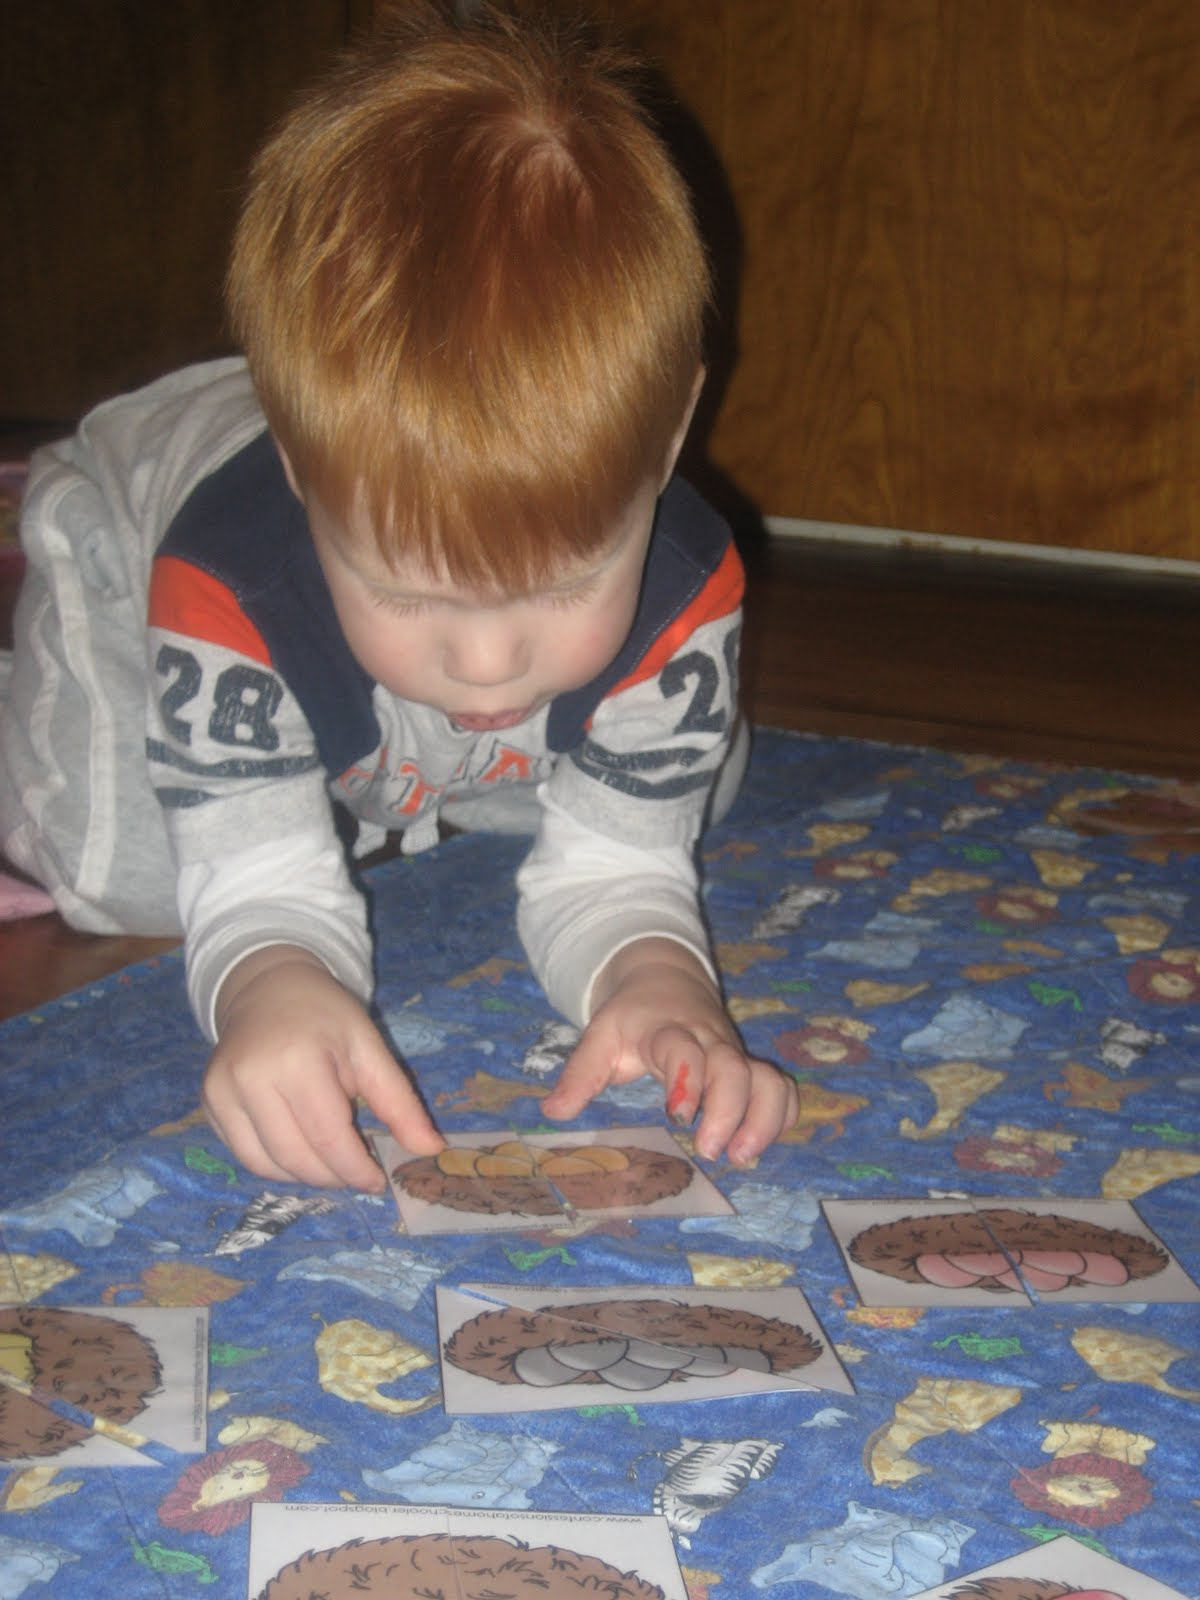 The Preschool Experiment February